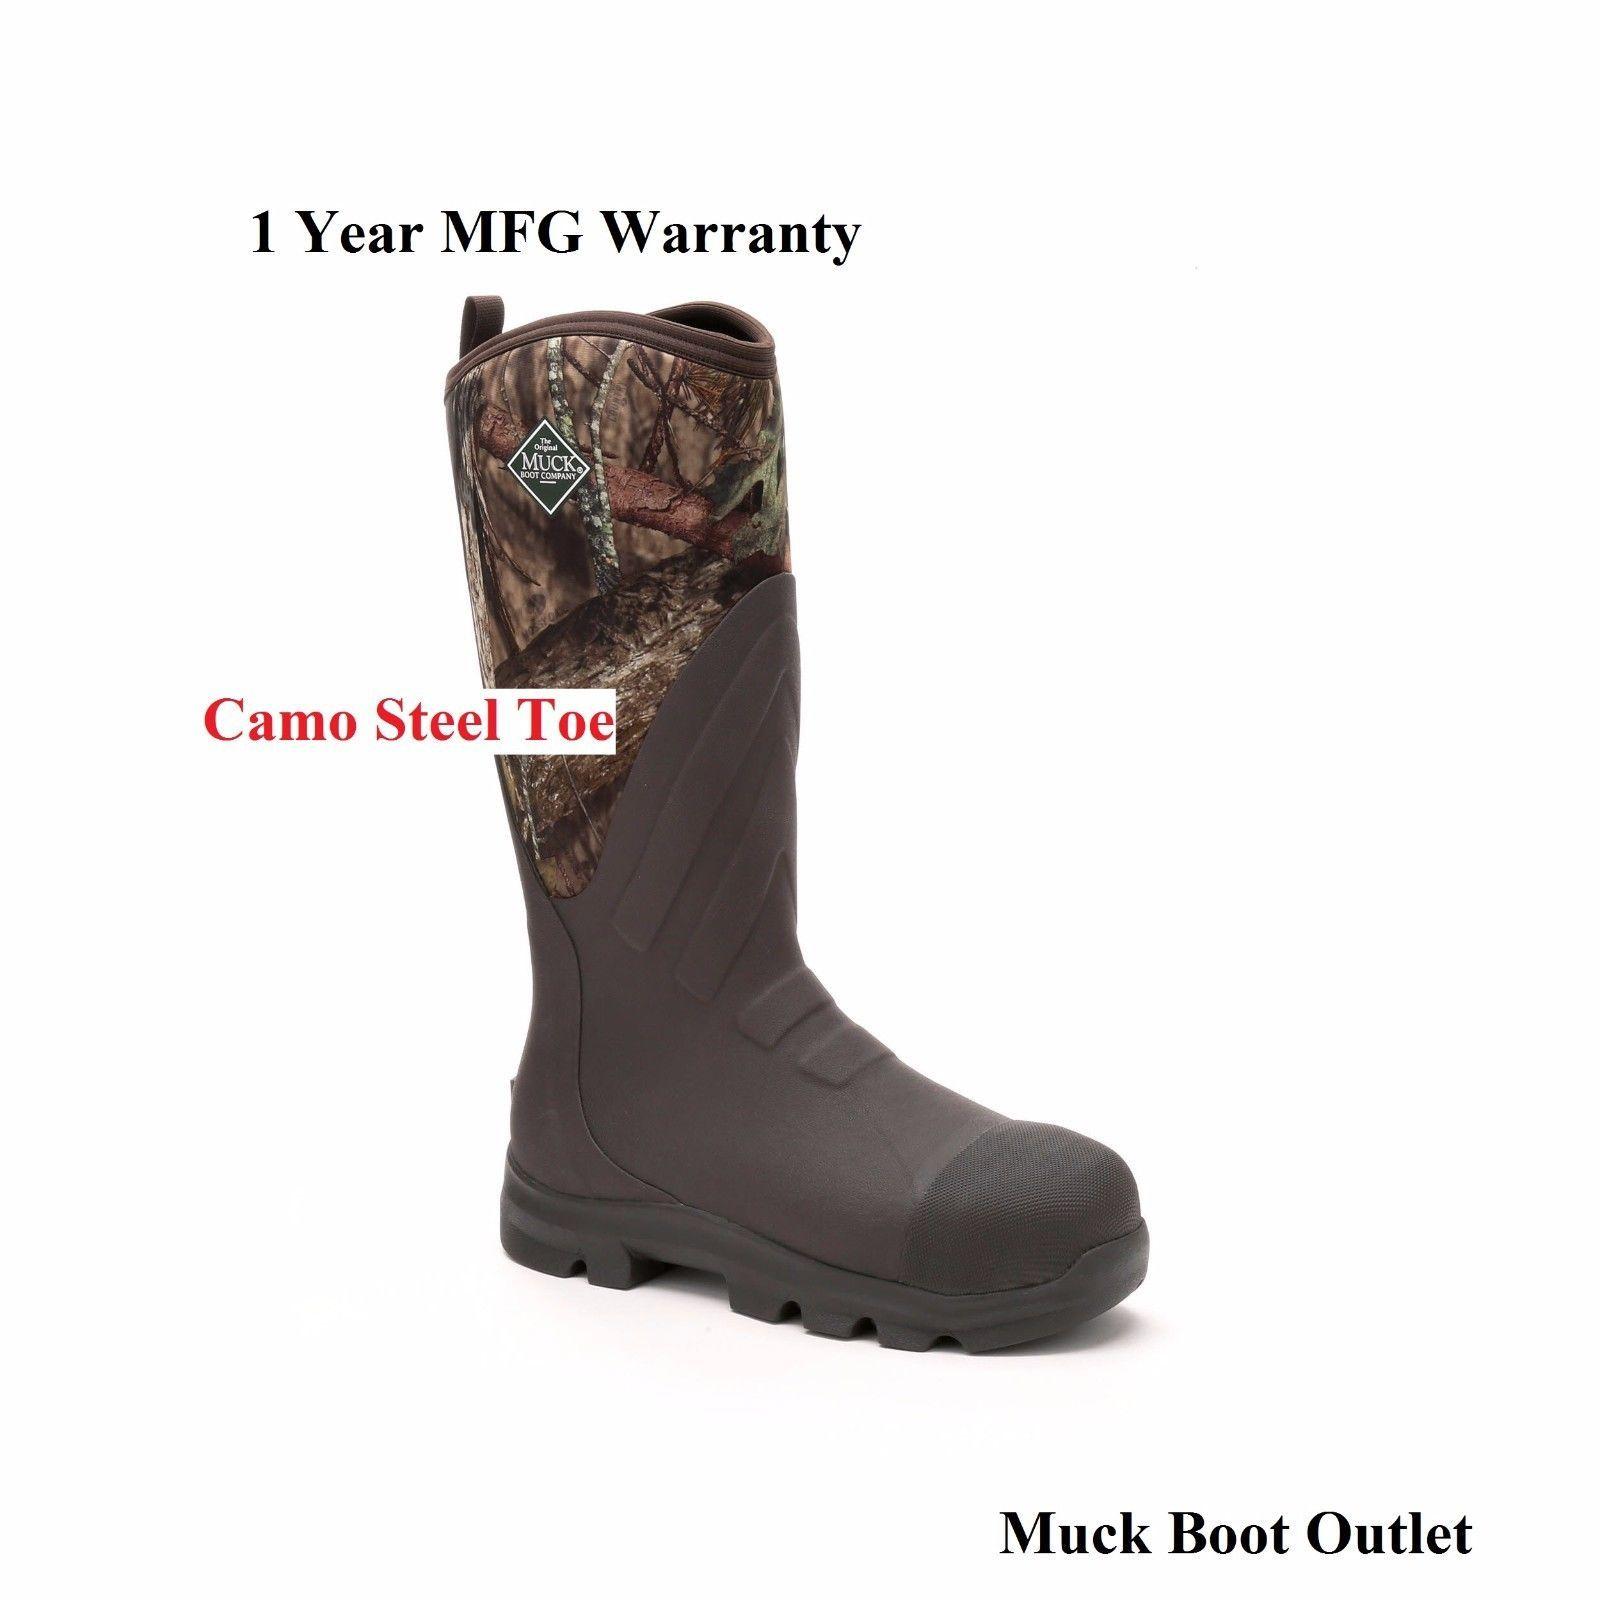 Muck Boot Company Warranty - Yu Boots